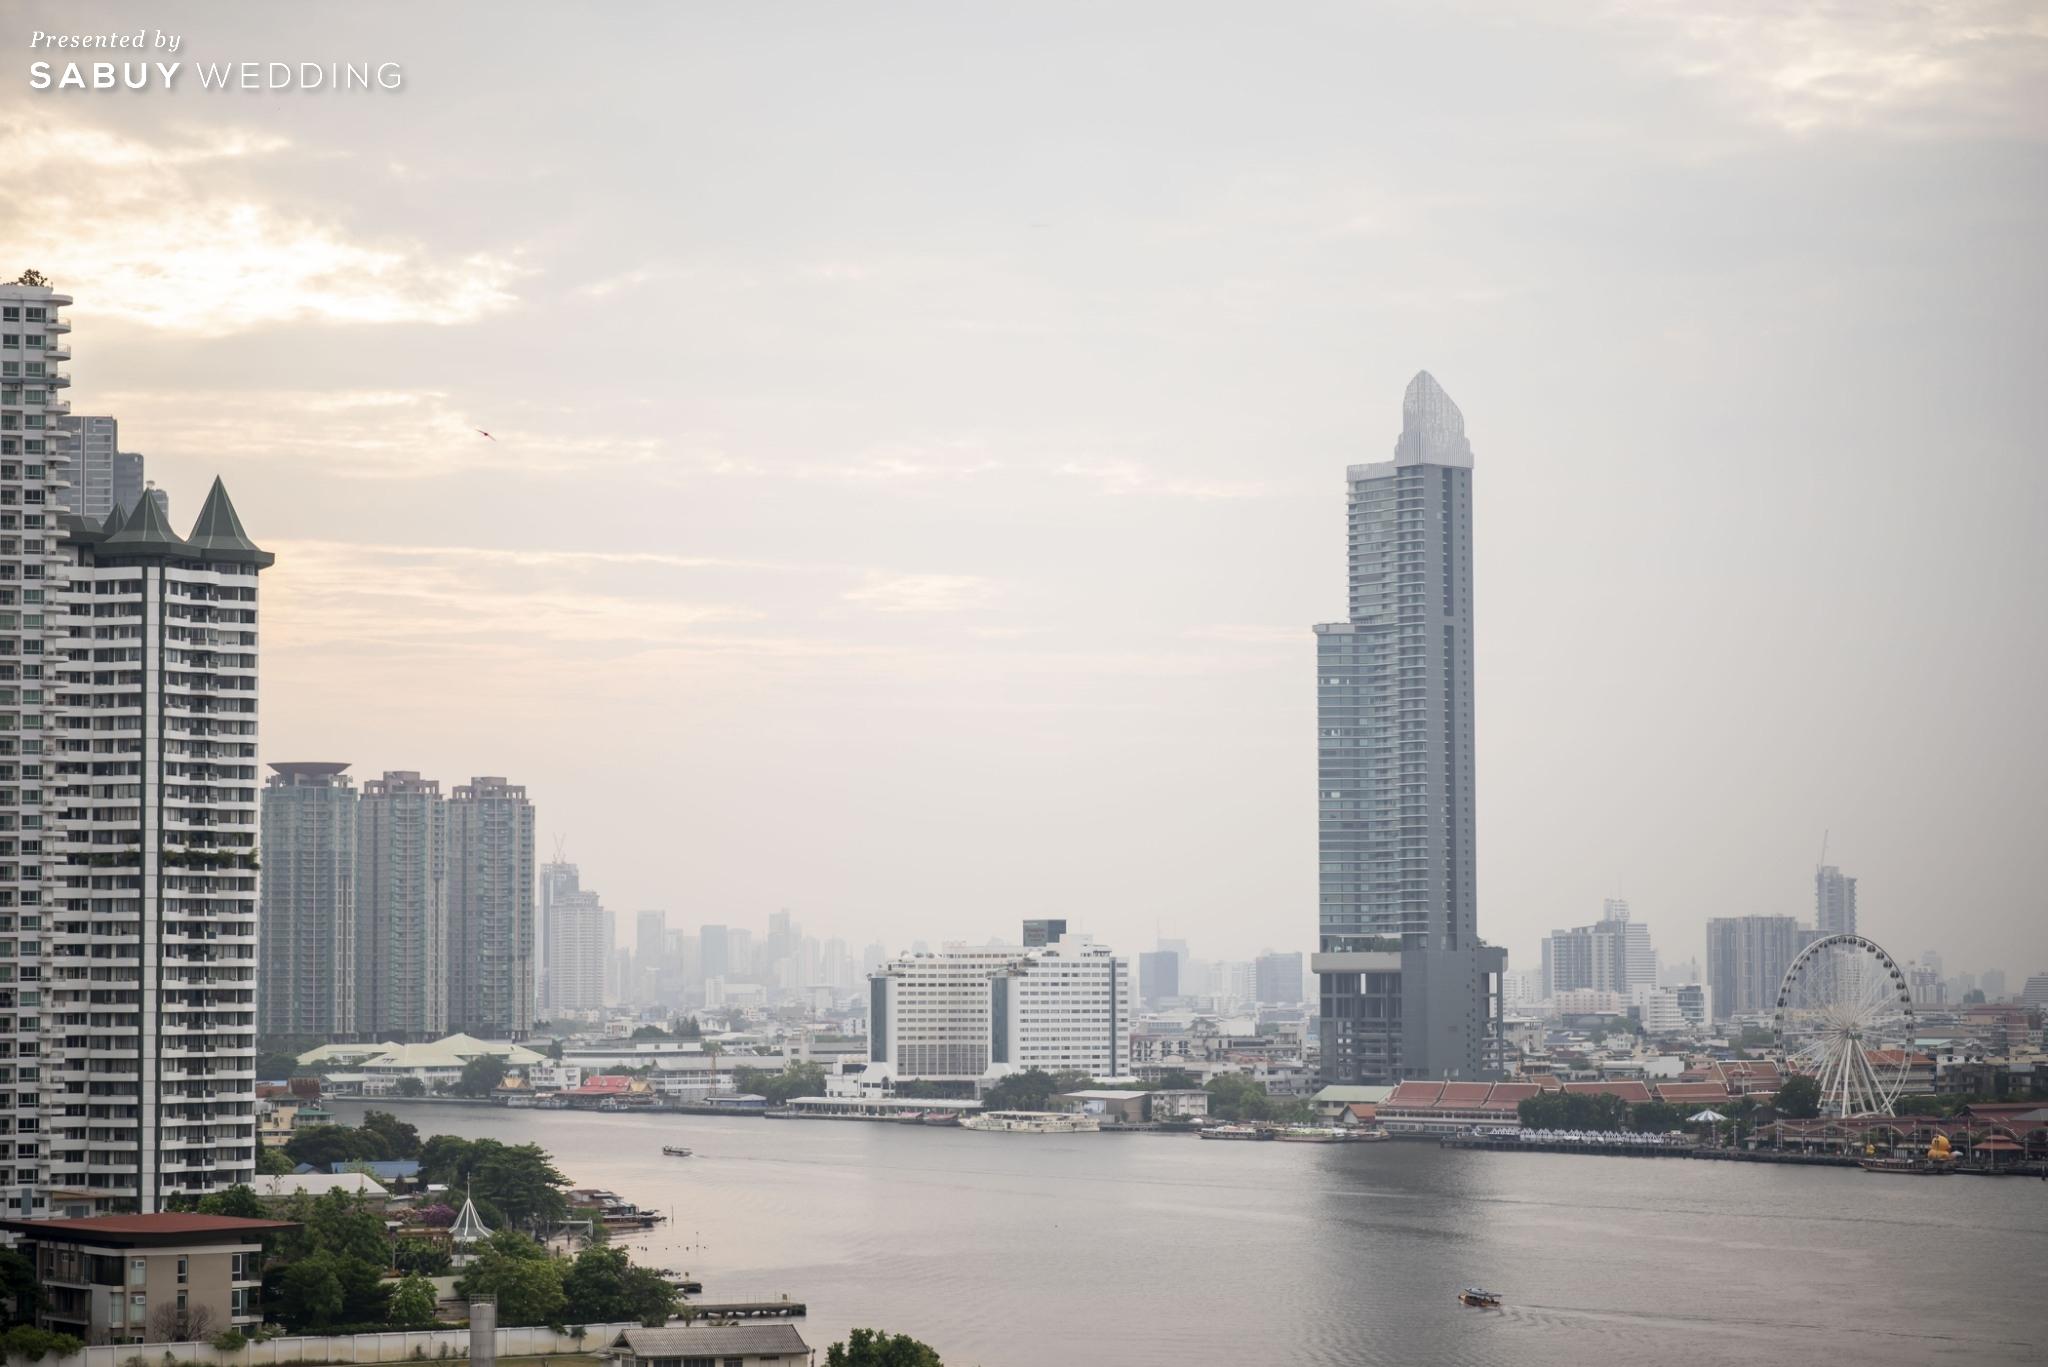 AVANI+ Riverside Bangkok Hotel รีวิวงานแต่งแซ่บจี๊ดใจ สวยสดใสด้วยโทนสี Colorful @ AVANI+ Riverside Bangkok Hotel